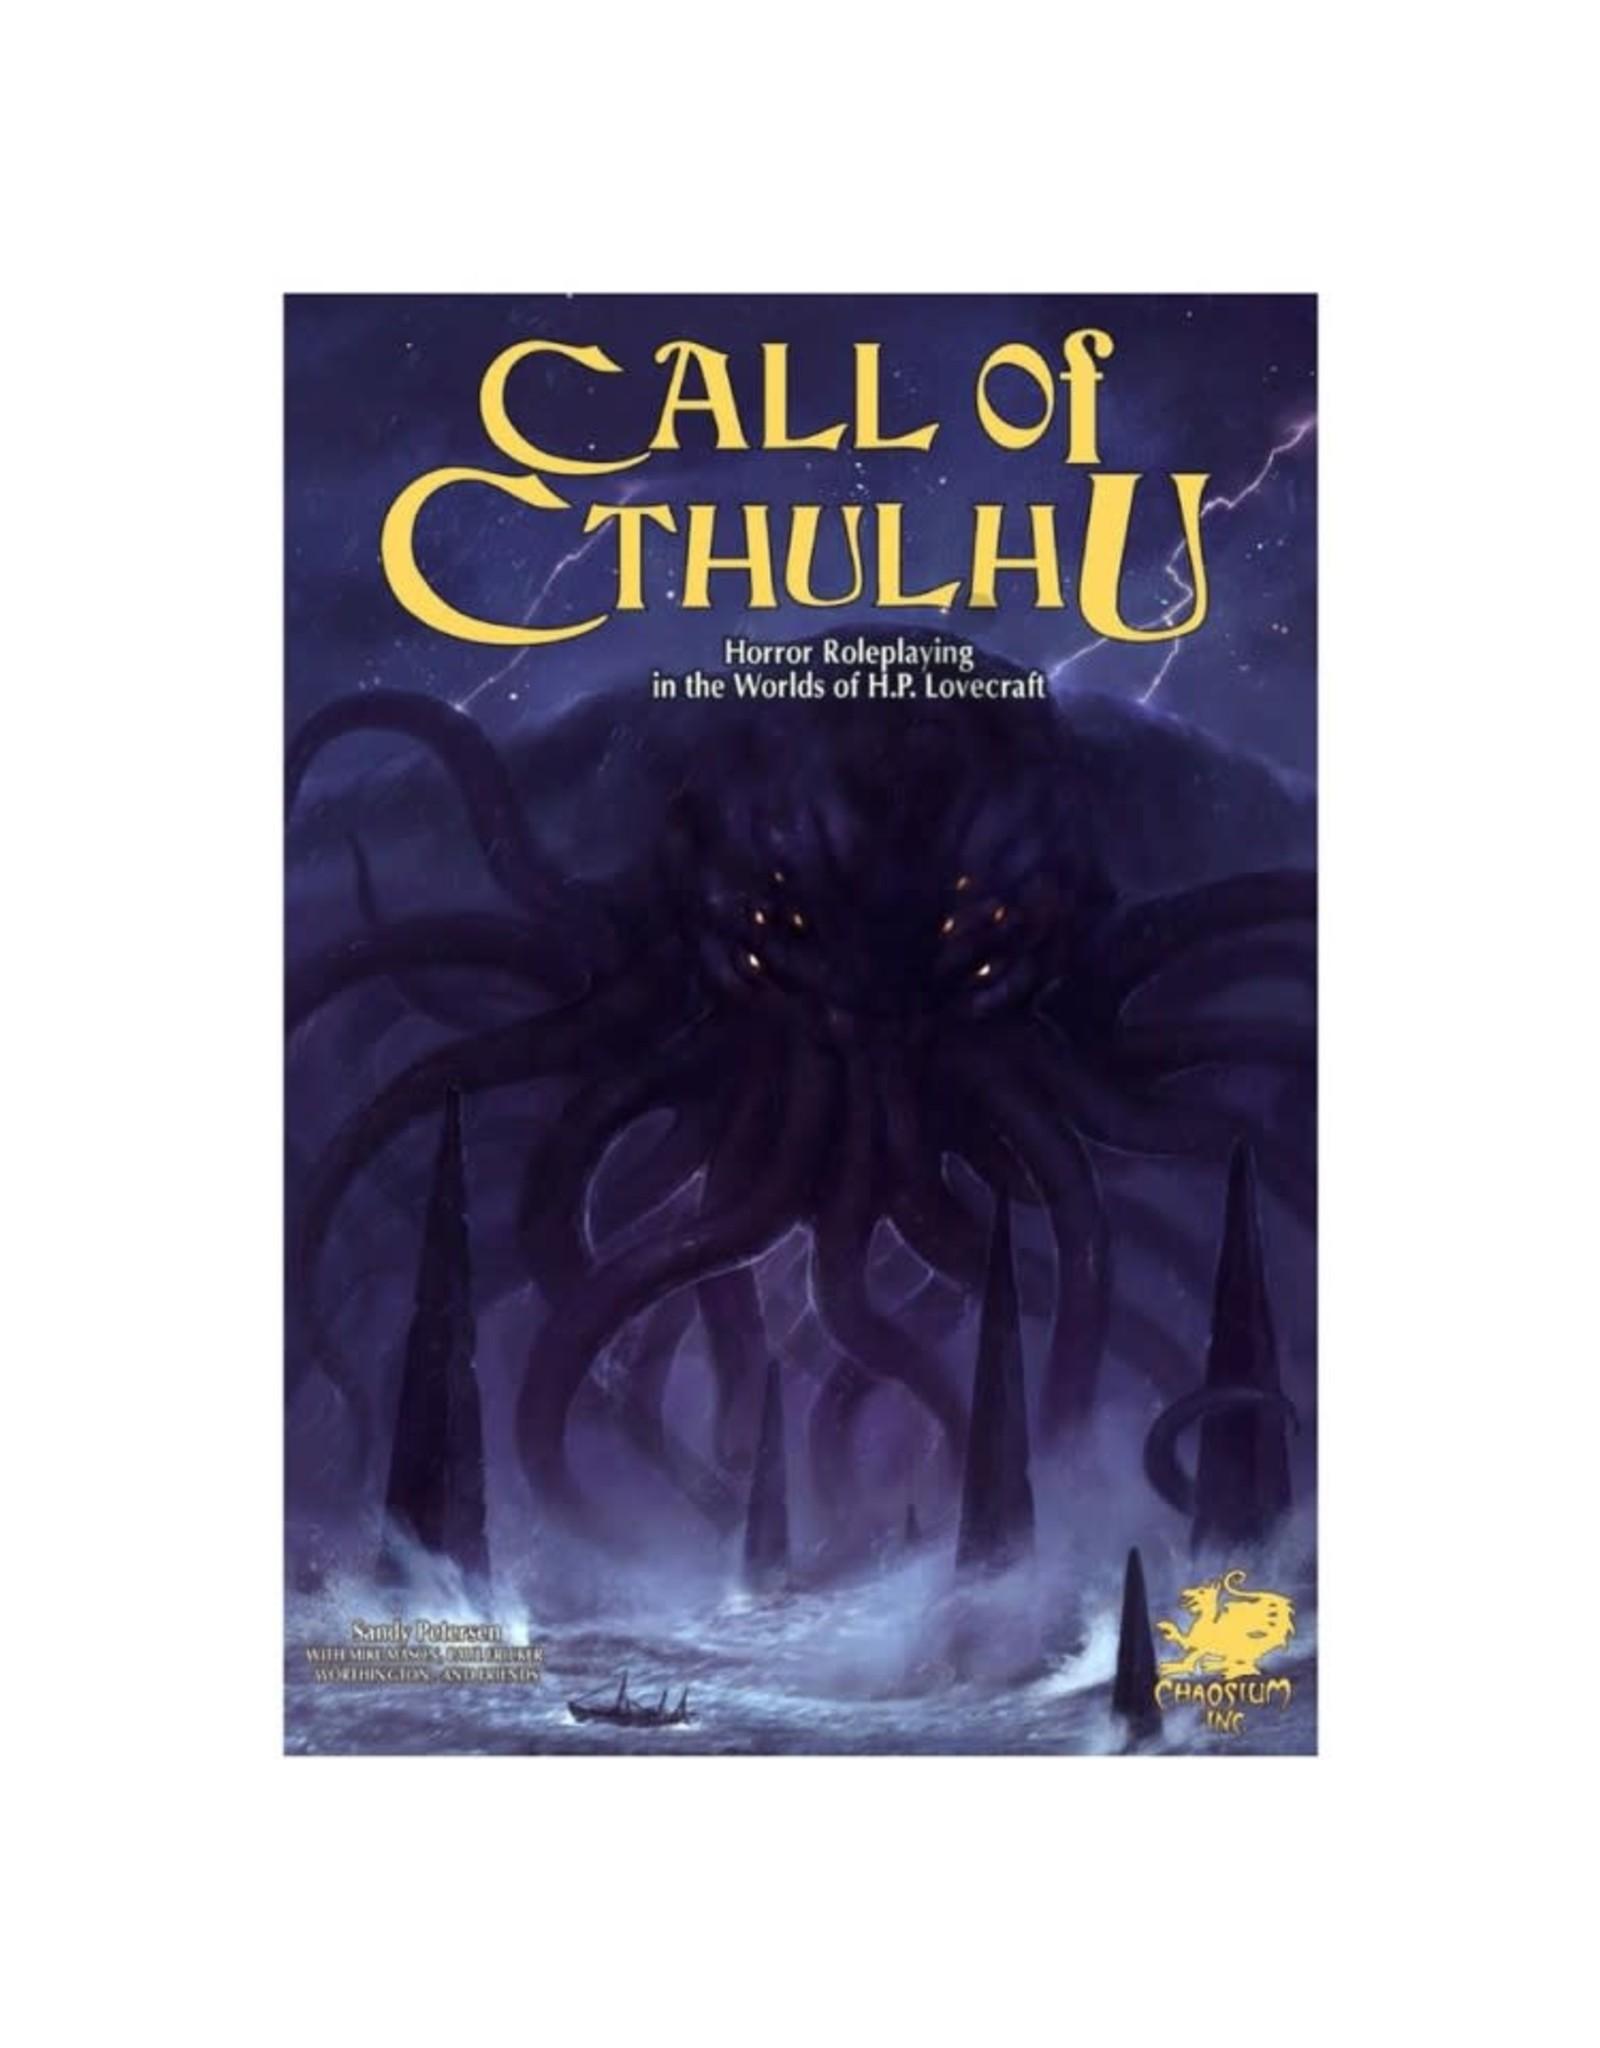 Chaosium Call of Cthulhu: Keeper Rulebook